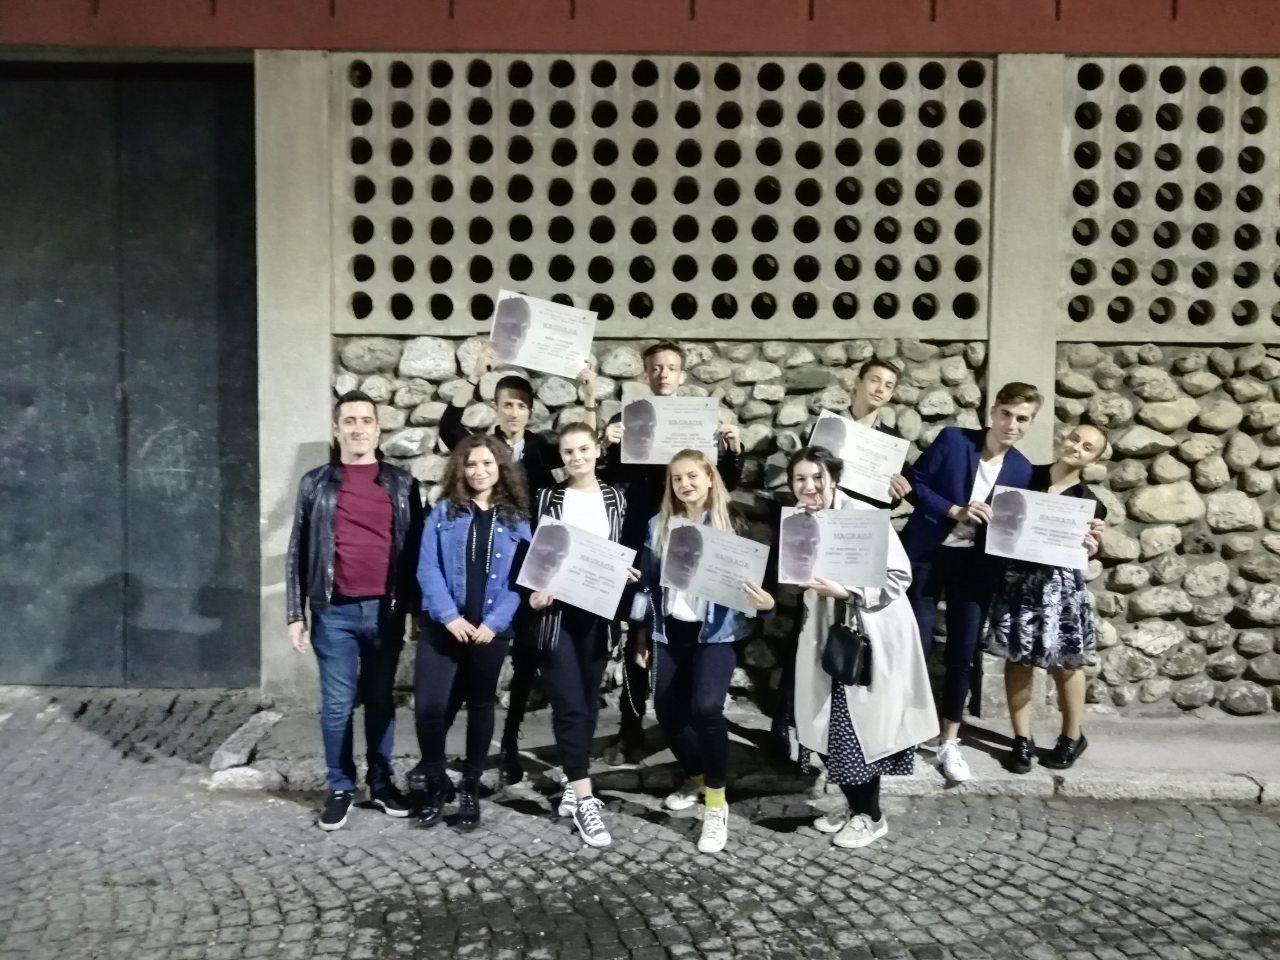 Završen 17. Festival srednjoškolskog dramskog stvaralaštva u Konjicu – Za Kakanj 7 nagrada